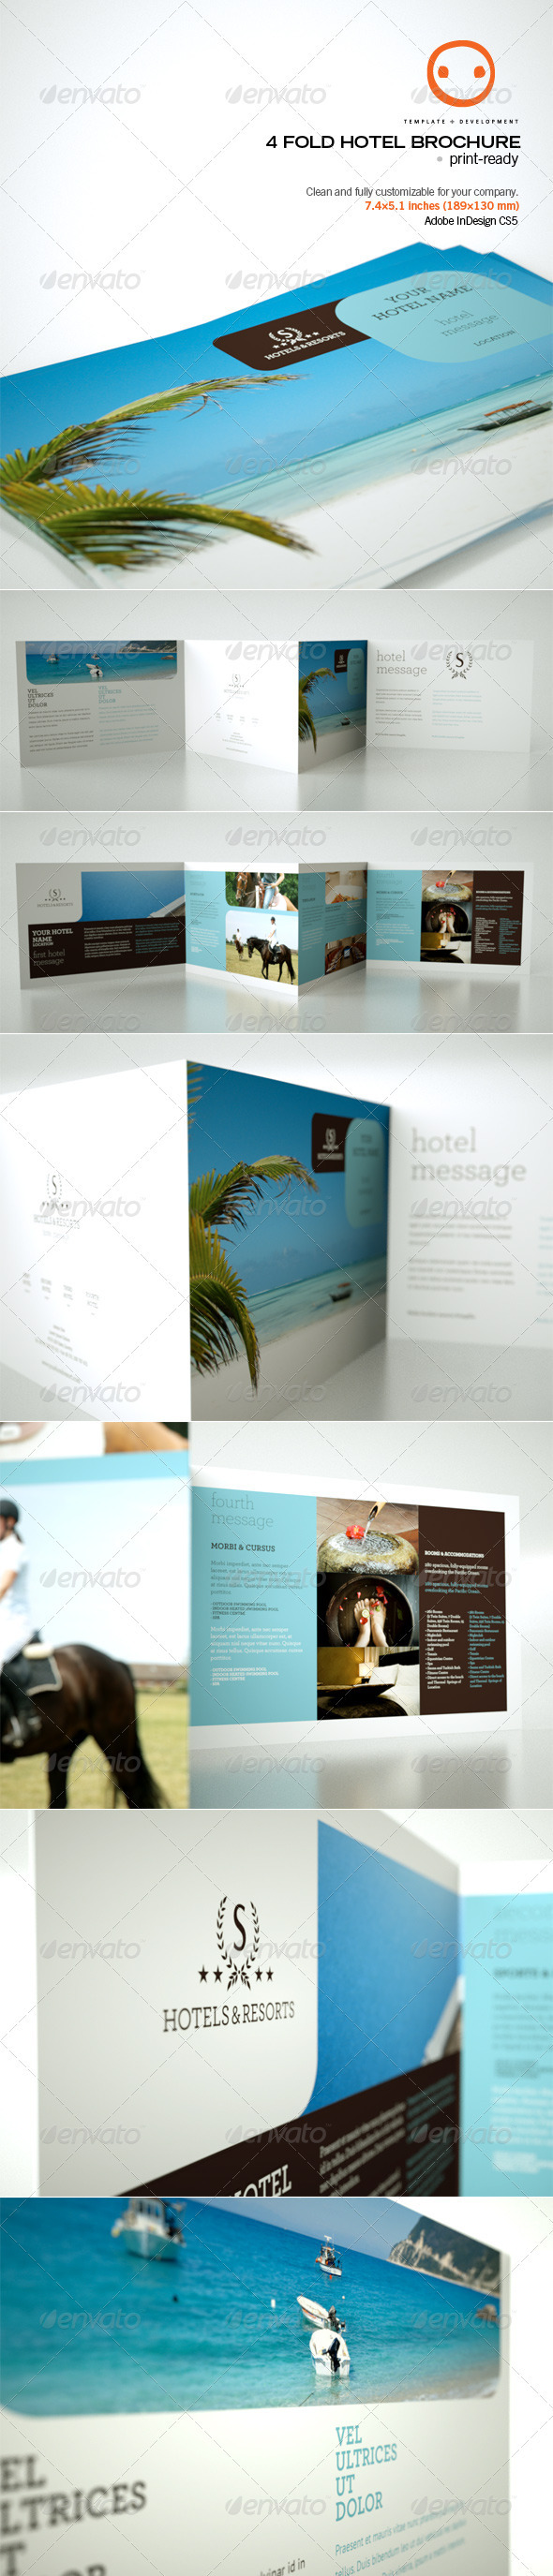 4 Fold Hotel Brochure - Corporate Brochures